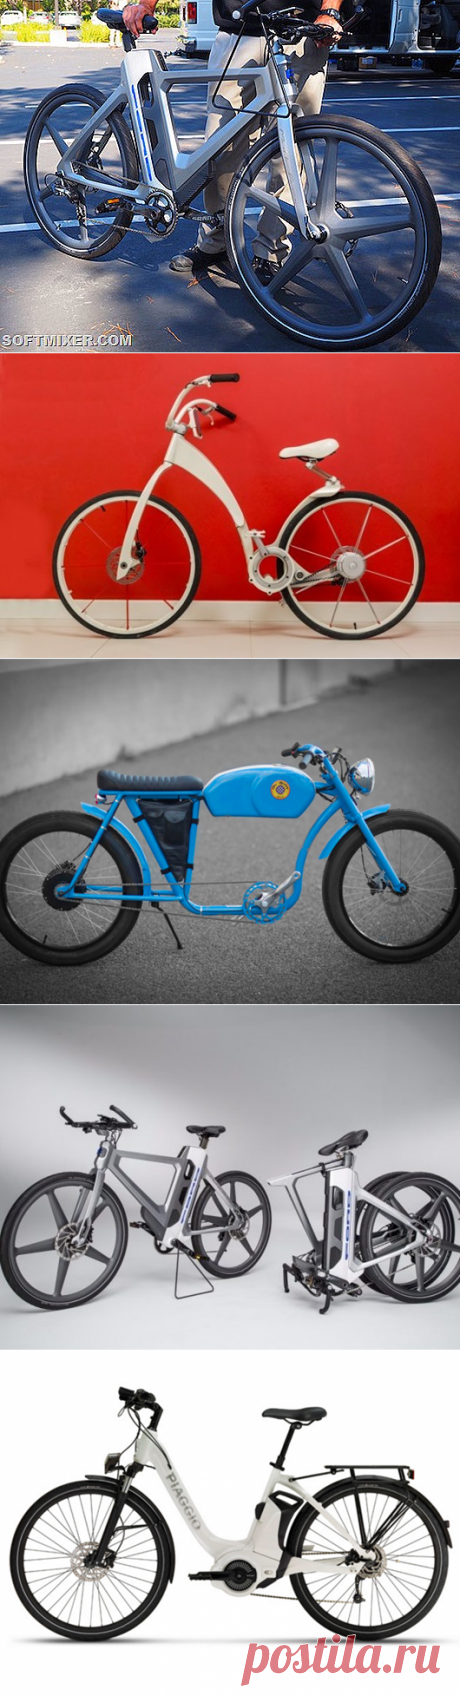 Las bicicletas del futuro próximo   SOFTMIXER